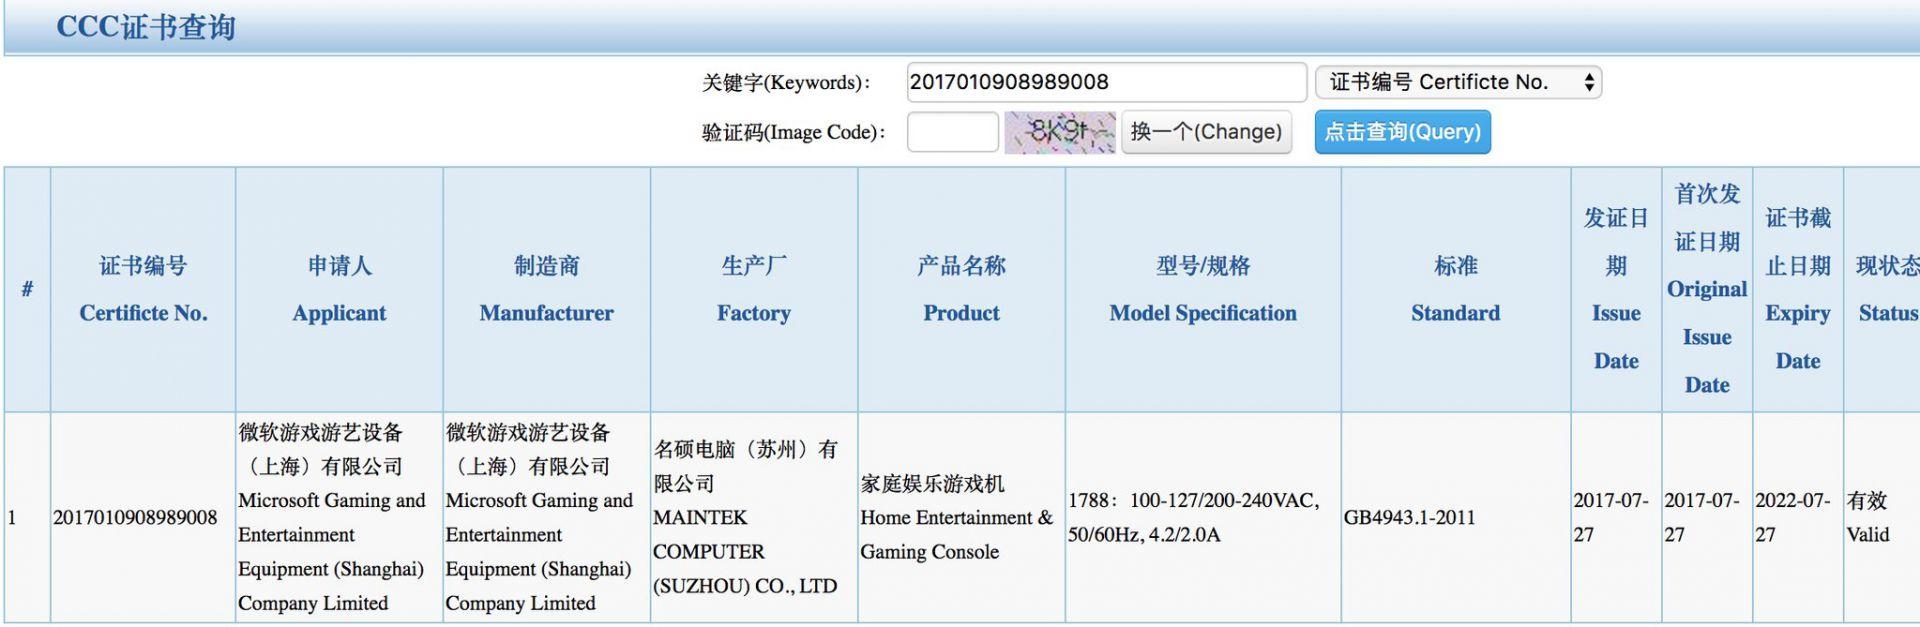 Xbox One X en China